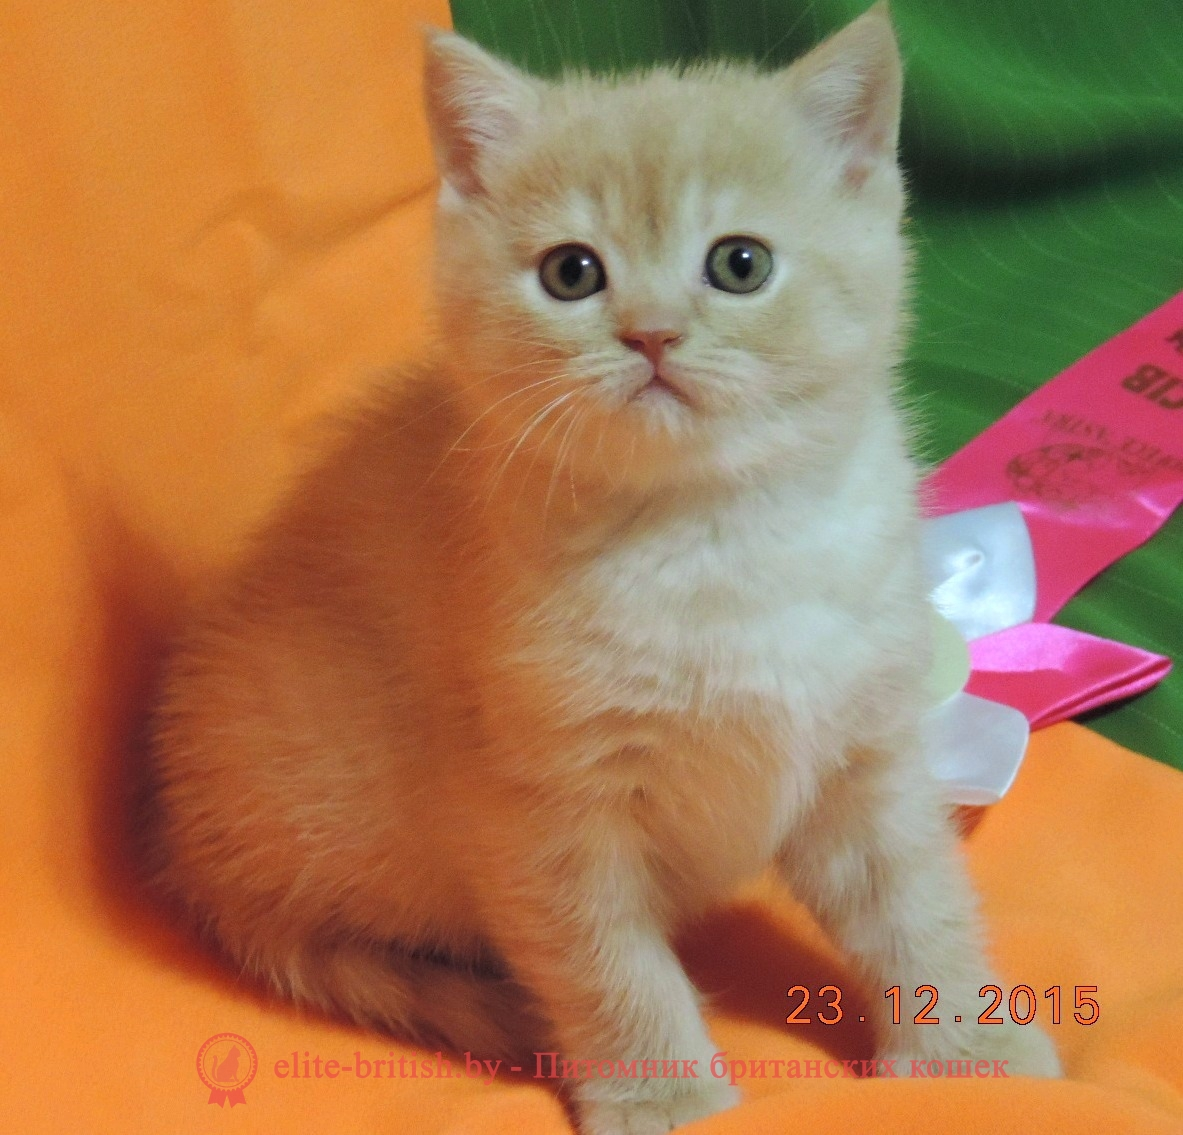 бежевые британцы, бежевый британец фото, кошки британские бежевые, бежевые британские коты, британские котята кремовые фото, британские кремовые коты фото, кремовый британец фото, британские котята кремового окраса фото, британец персикового цвета фото, британские котята персиковые фото, британские персиковые котята, британец персиковый, британец персиковый фото, британцы персикового окраса, британские котята кремового окраса, кремовый окрас британских кошек, британцы кремового окраса, британский кот кремового окраса, британская кошка кремовый окрас фото, британские котята кремового окраса фото, затушеванный британец, серебристый затушеванный британец, кошки британские серебристые, британская короткошерстная окраса серебро, купить британского котенка в минске, купить в минске котенка британца, купить британского котенка, британские котята в гомеле купить, купить британского котенка в могилеве, купить британского котенка в витебске, купить британского котенка в бресте, купить кота британца в минске, купить британского котенка в гродно, купить британца в барановичах, купить британского котенка в бобруйске, купить британца в минске, британец купить, купить вислоухого британца, британский кот купить в минске, купить британского котенка в беларуси, купить британского котенка в барановичах,  купить британского котенка в пинске, купить котенка британца, купить котенка британца в могилеве, британская кошка купить в минске,  купить британского котенка в мозыре, британец вислоухий купить в минске, купить британского котенка в молодечно, купить британского котенка в полоцке, купить котенка британца в витебске, купить британца в минске недорого, купить британца в могилеве, купить британца в бресте, купить британского котенка в жлобине, купить кота британца, купить британского плюшевого котенка, купить британского котенка в новополоцке, купить кота британца в гомеле, купить котенка британца в гомеле, купить британского кота, купить британского котенка в орше, купить британца в в